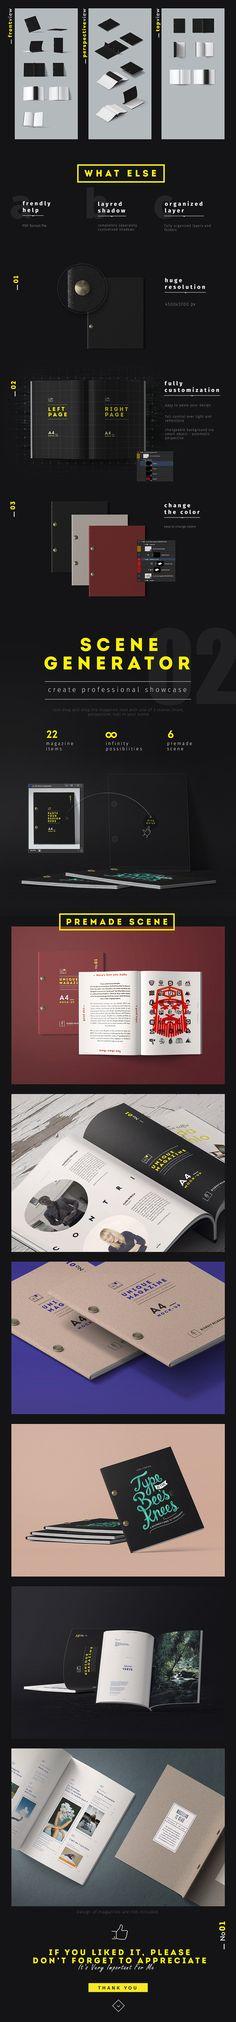 82 MAGAZINES MOCKUPS BUNDLE 41 items by Aleksey_Belorukov on @creativemarket #ad